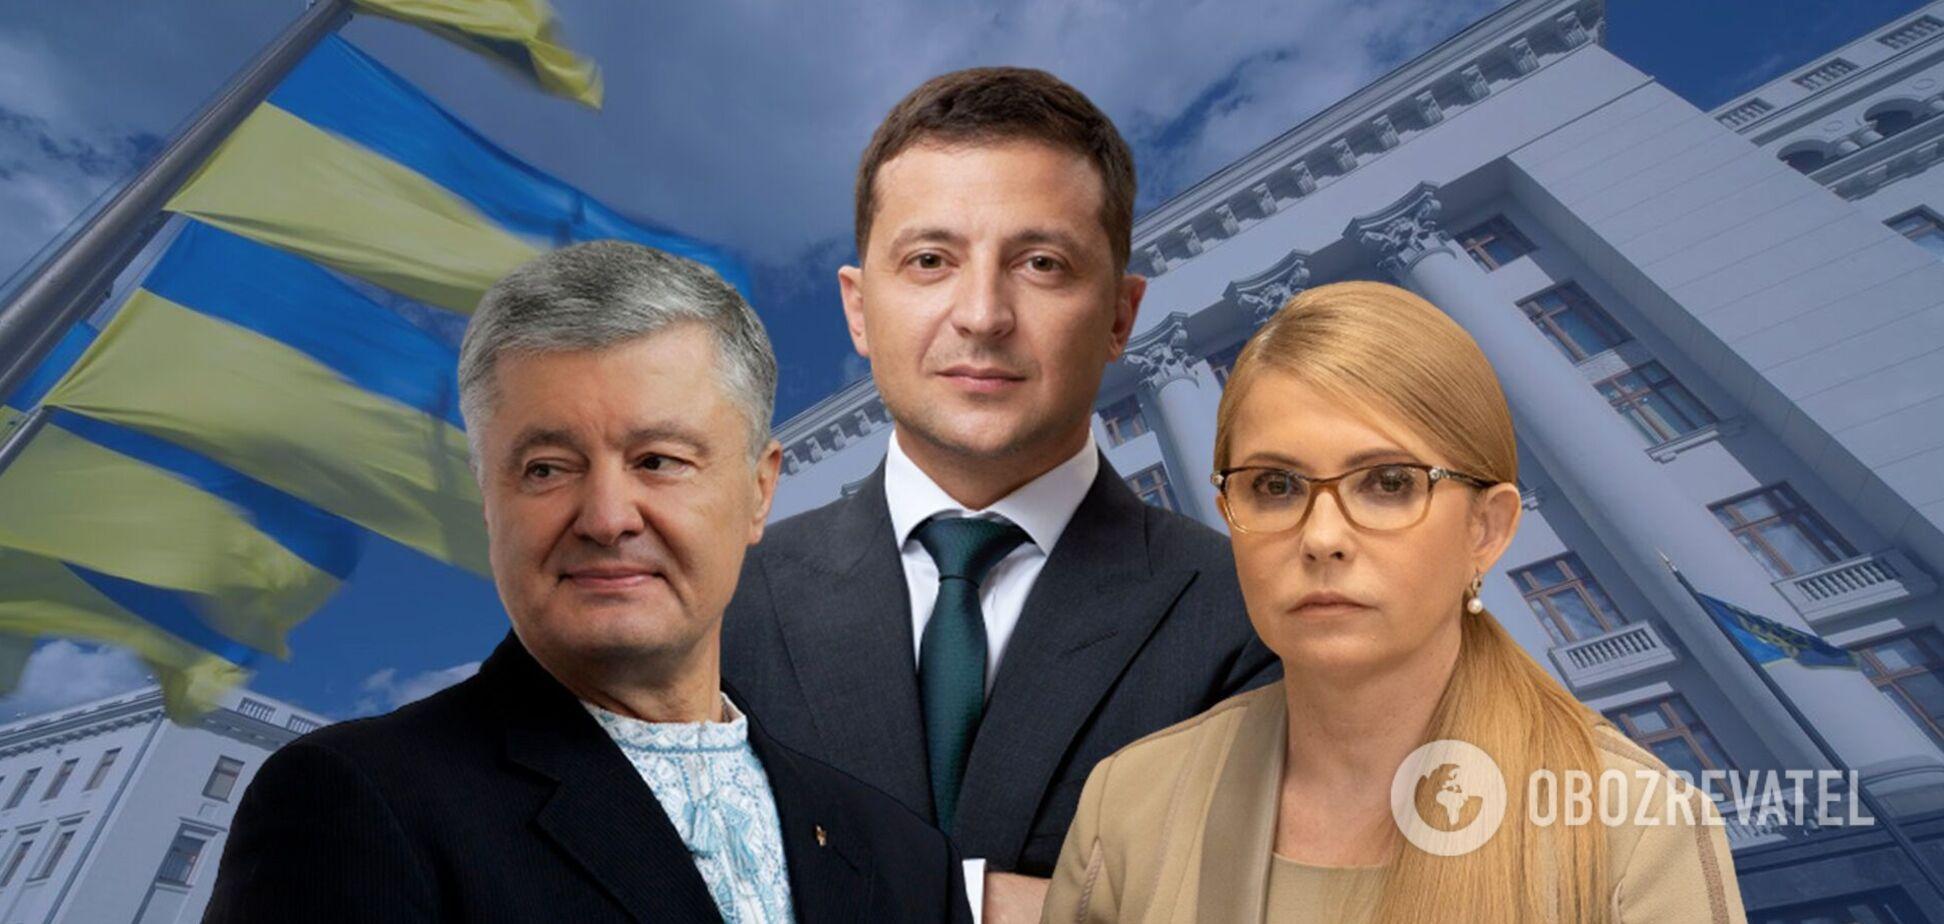 Рейтинги Зеленського, Порошенко і Тимошенко